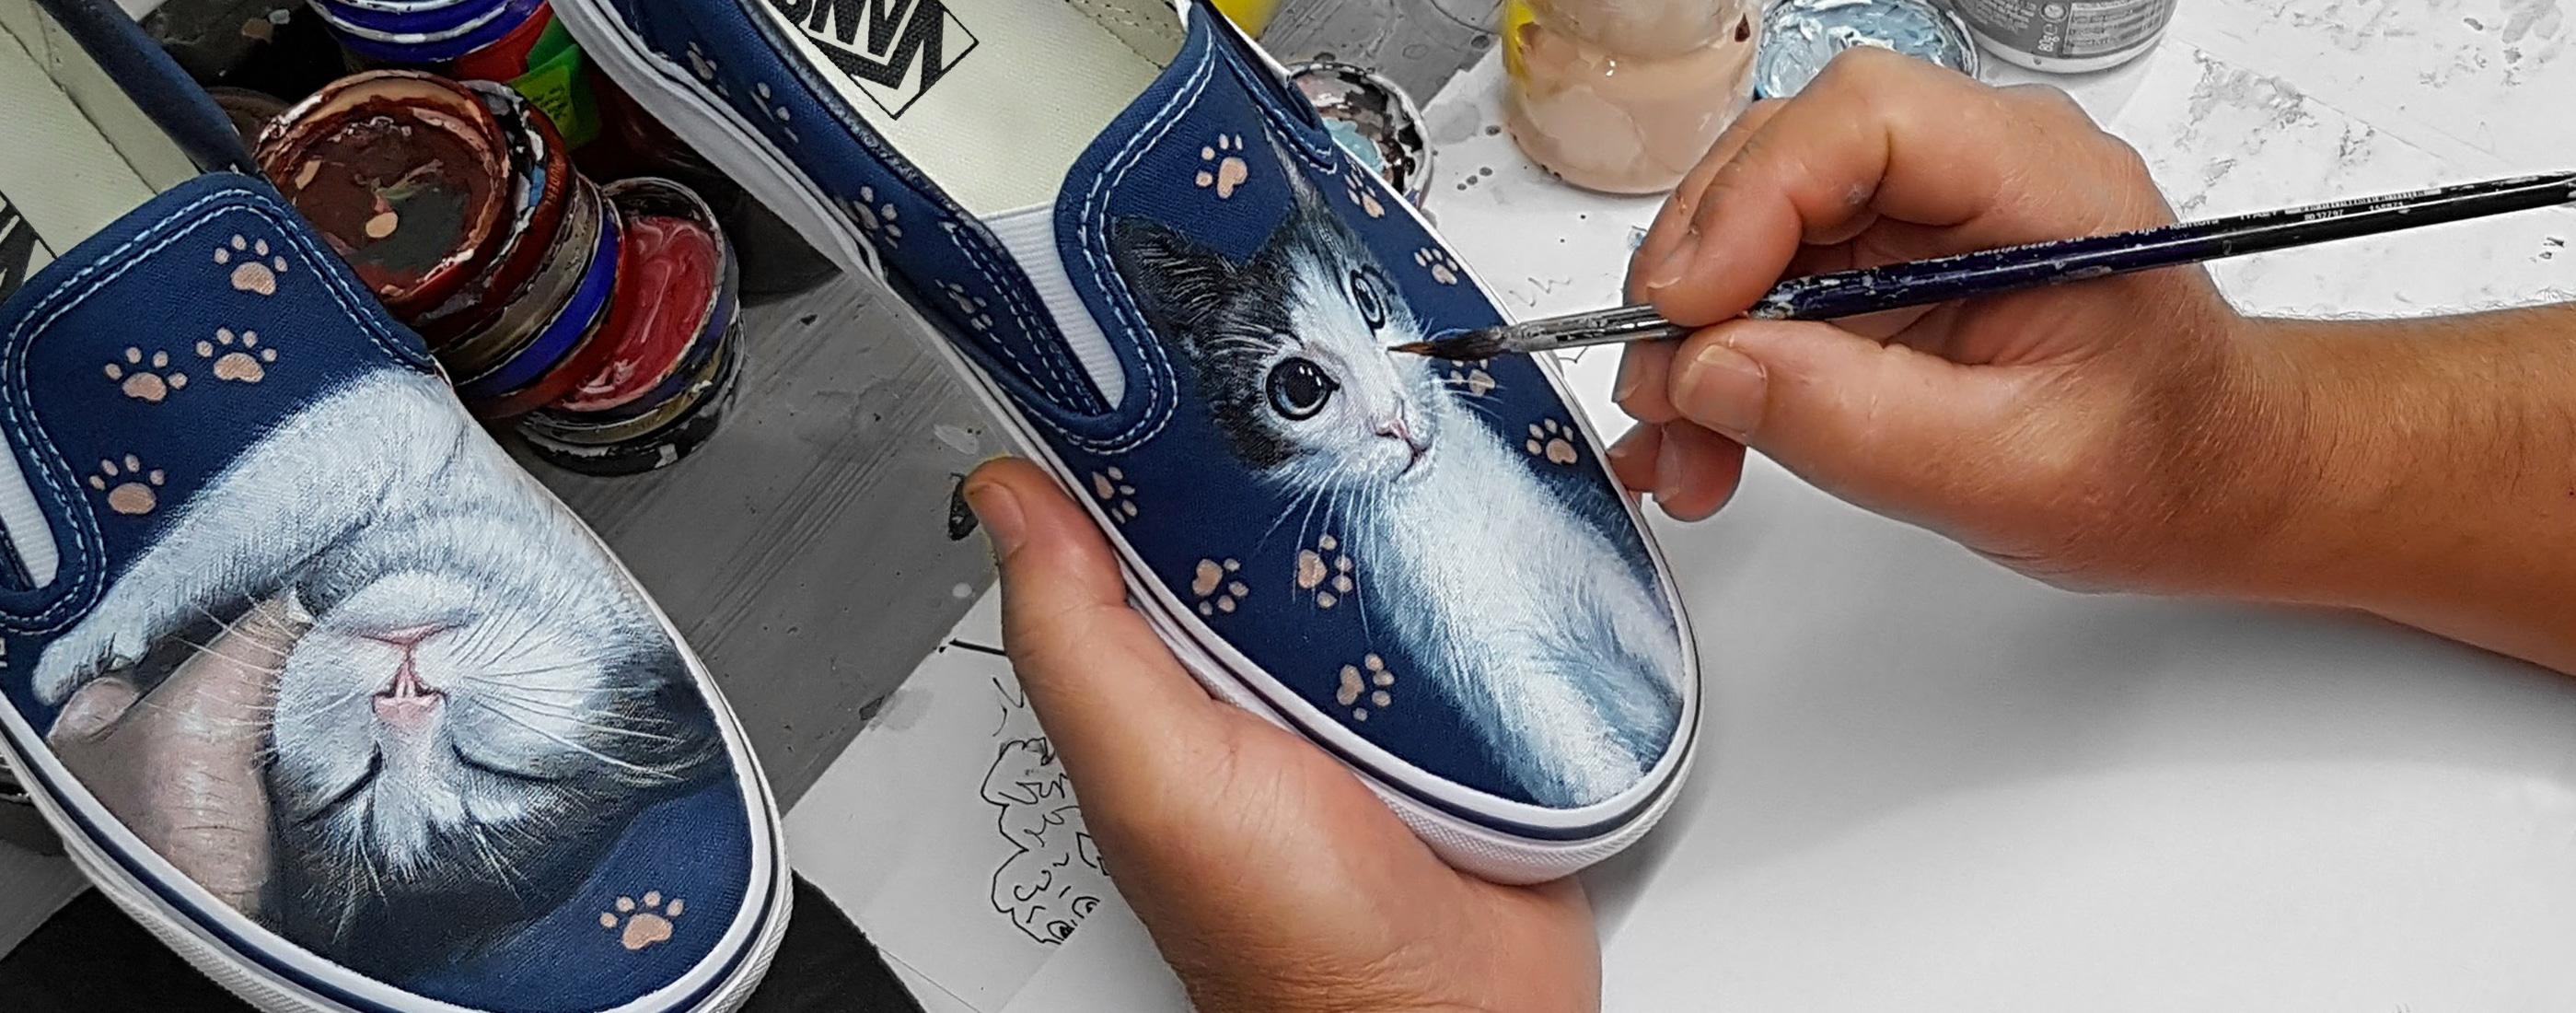 scarpe puma borchie